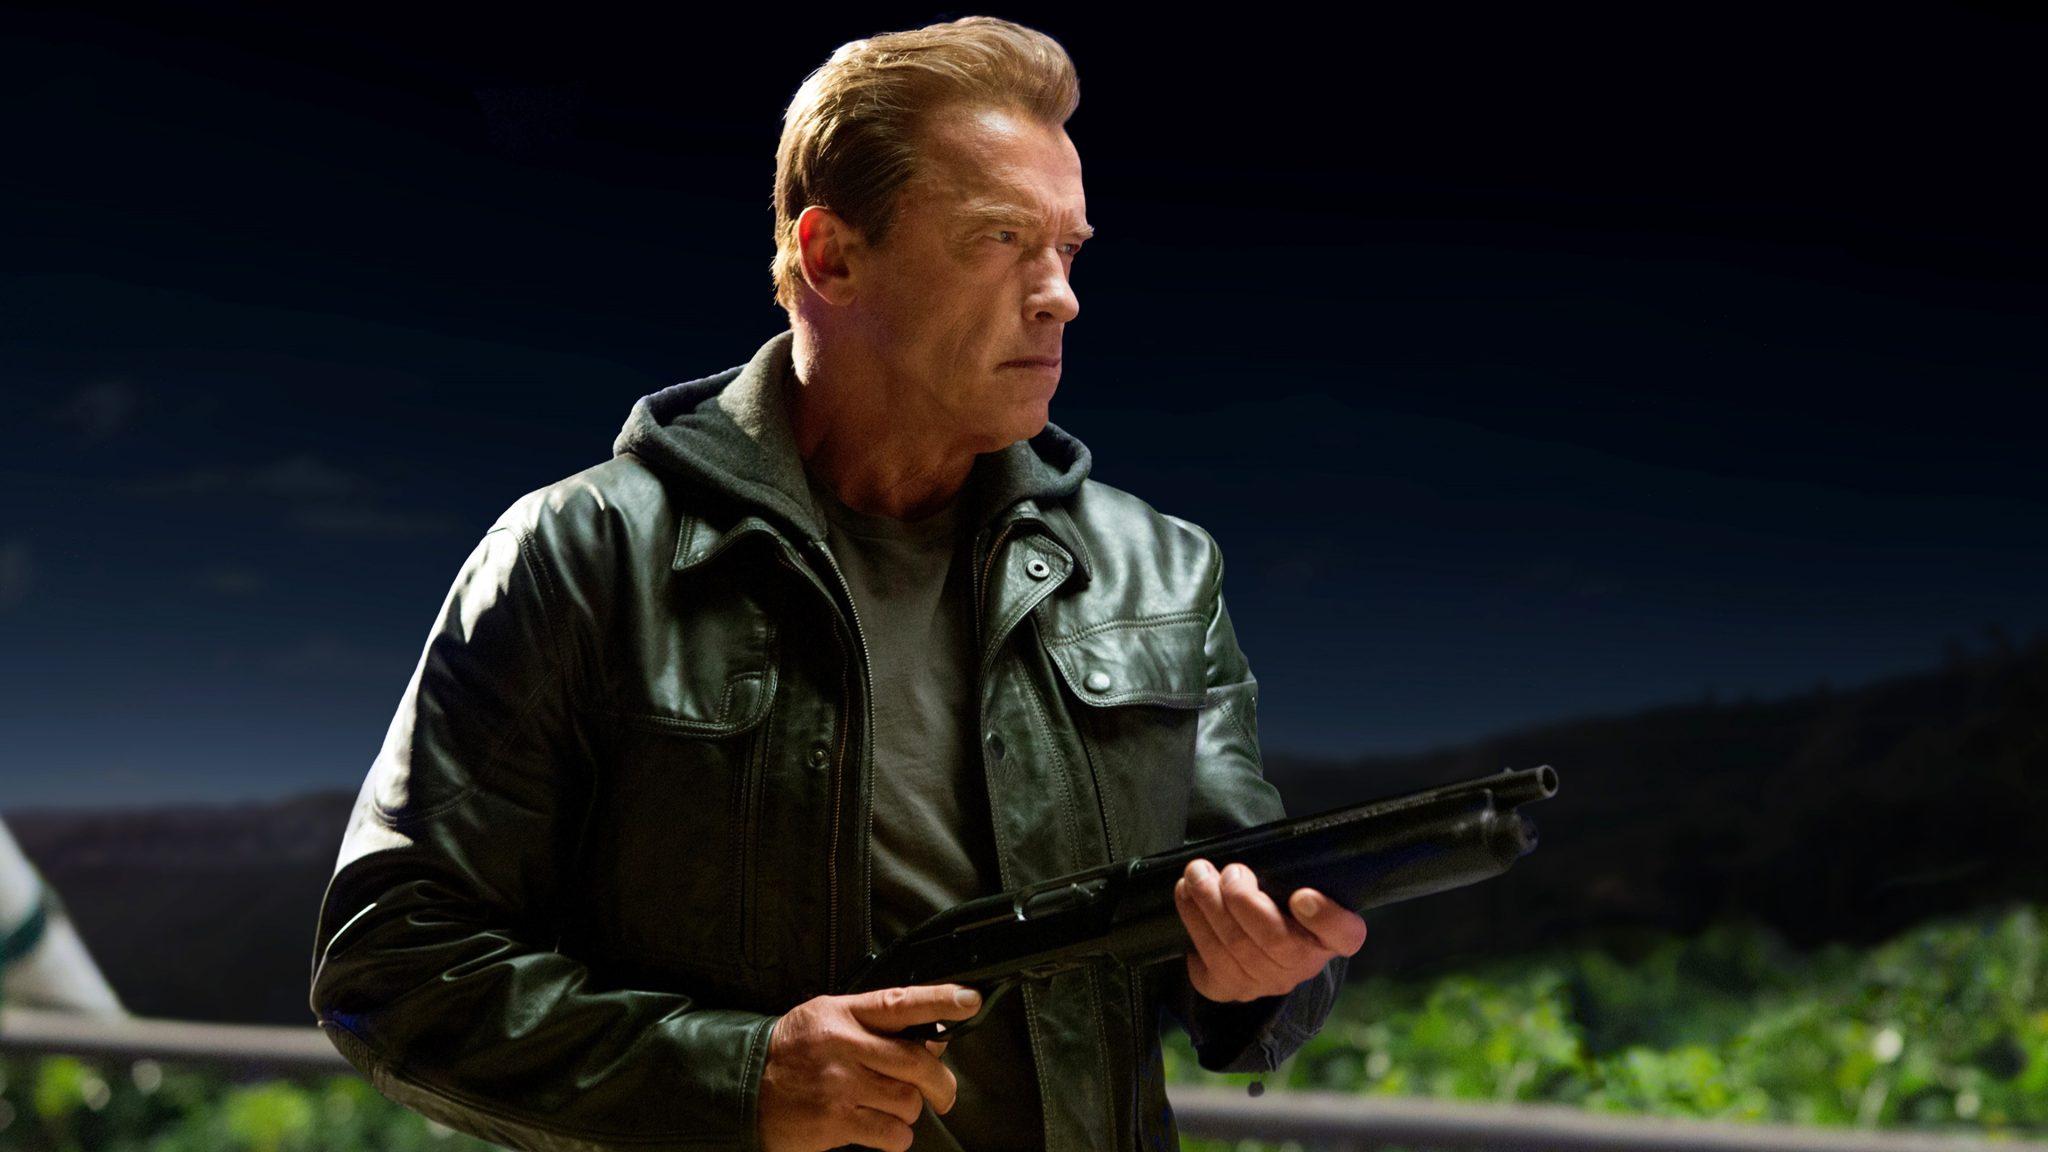 Terminator Genisys - Super Bowl trailer